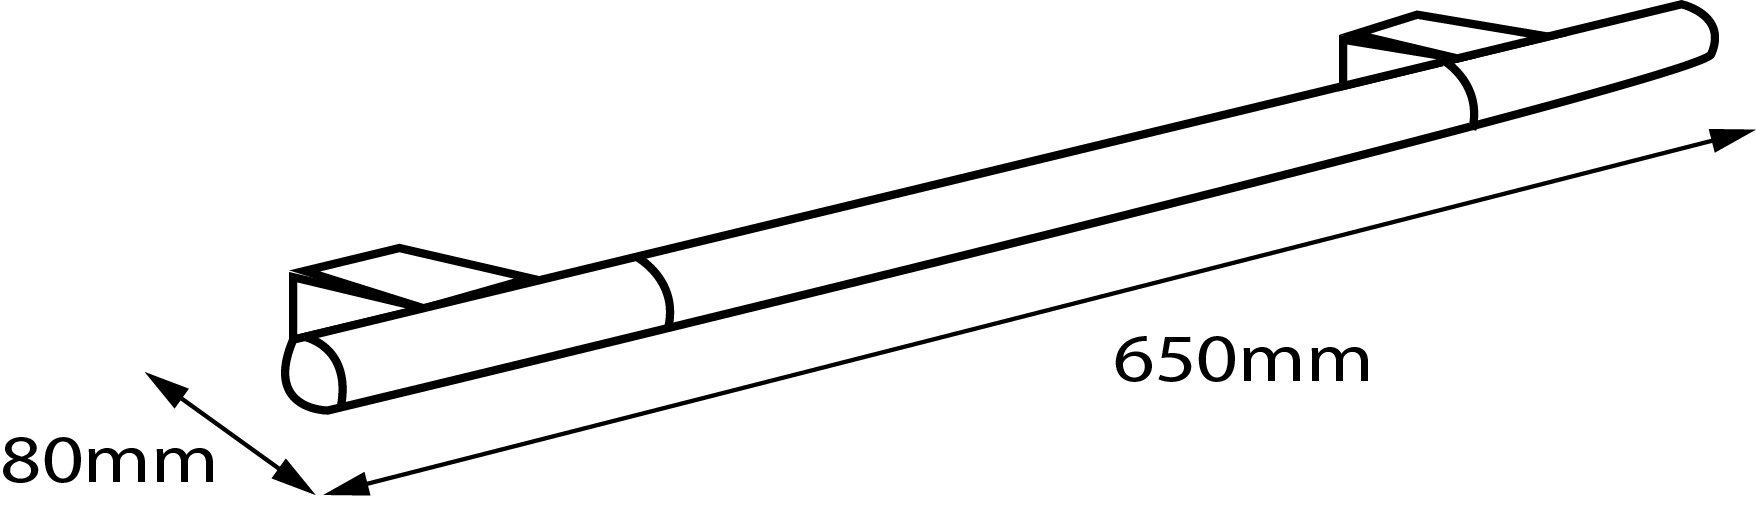 Iside Towel Rail (650mm)